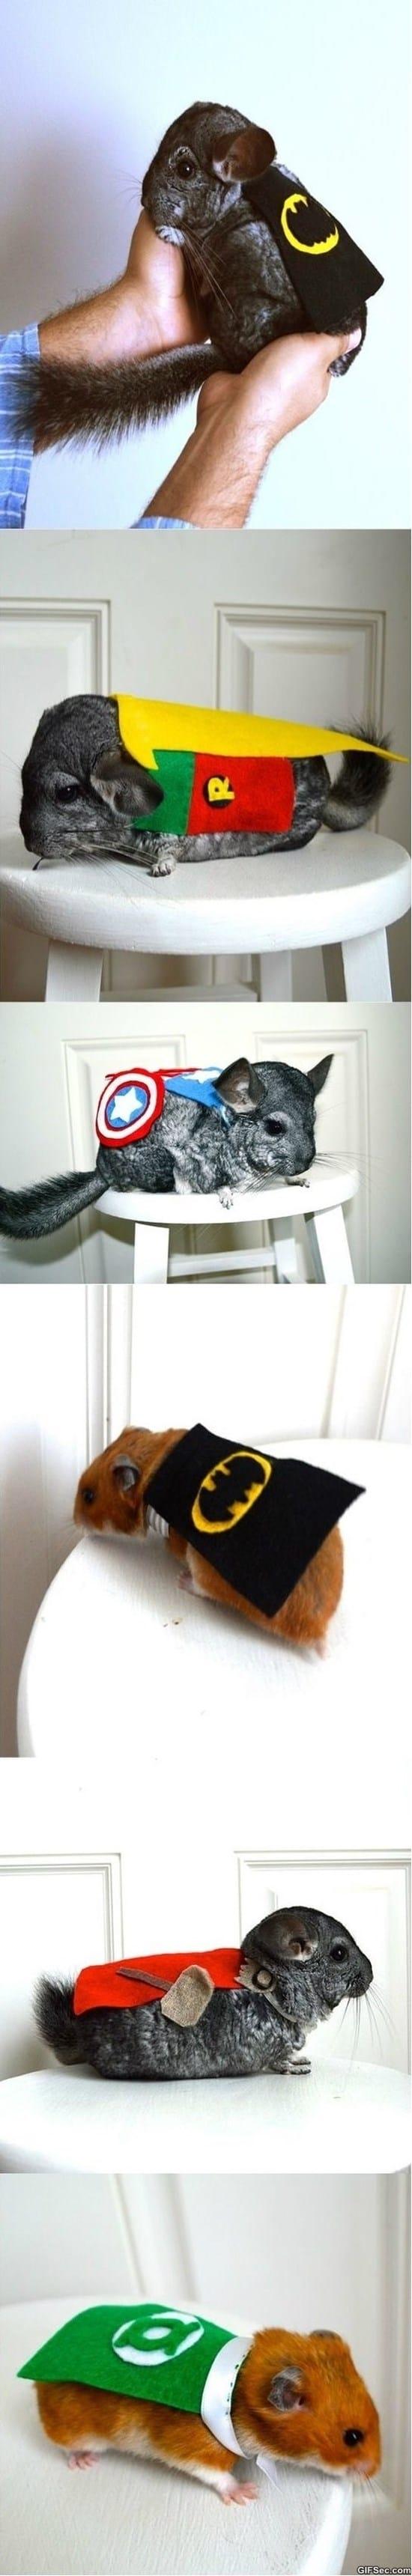 chinchillas-dressed-as-superheroes